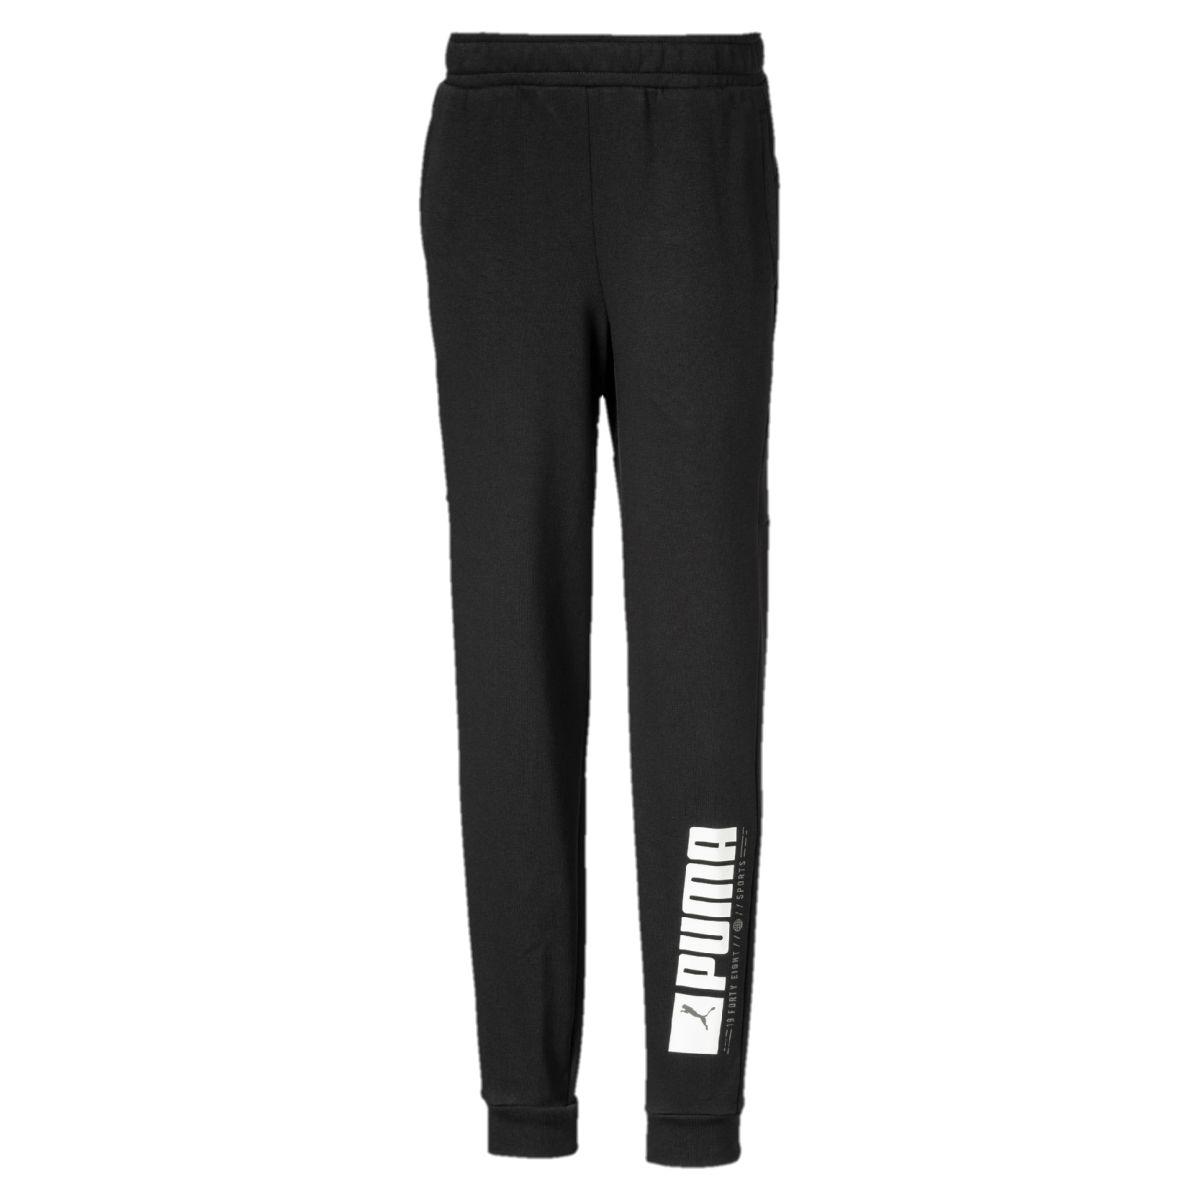 Брюки PUMA Active Sports Sweat Pants недорго, оригинальная цена